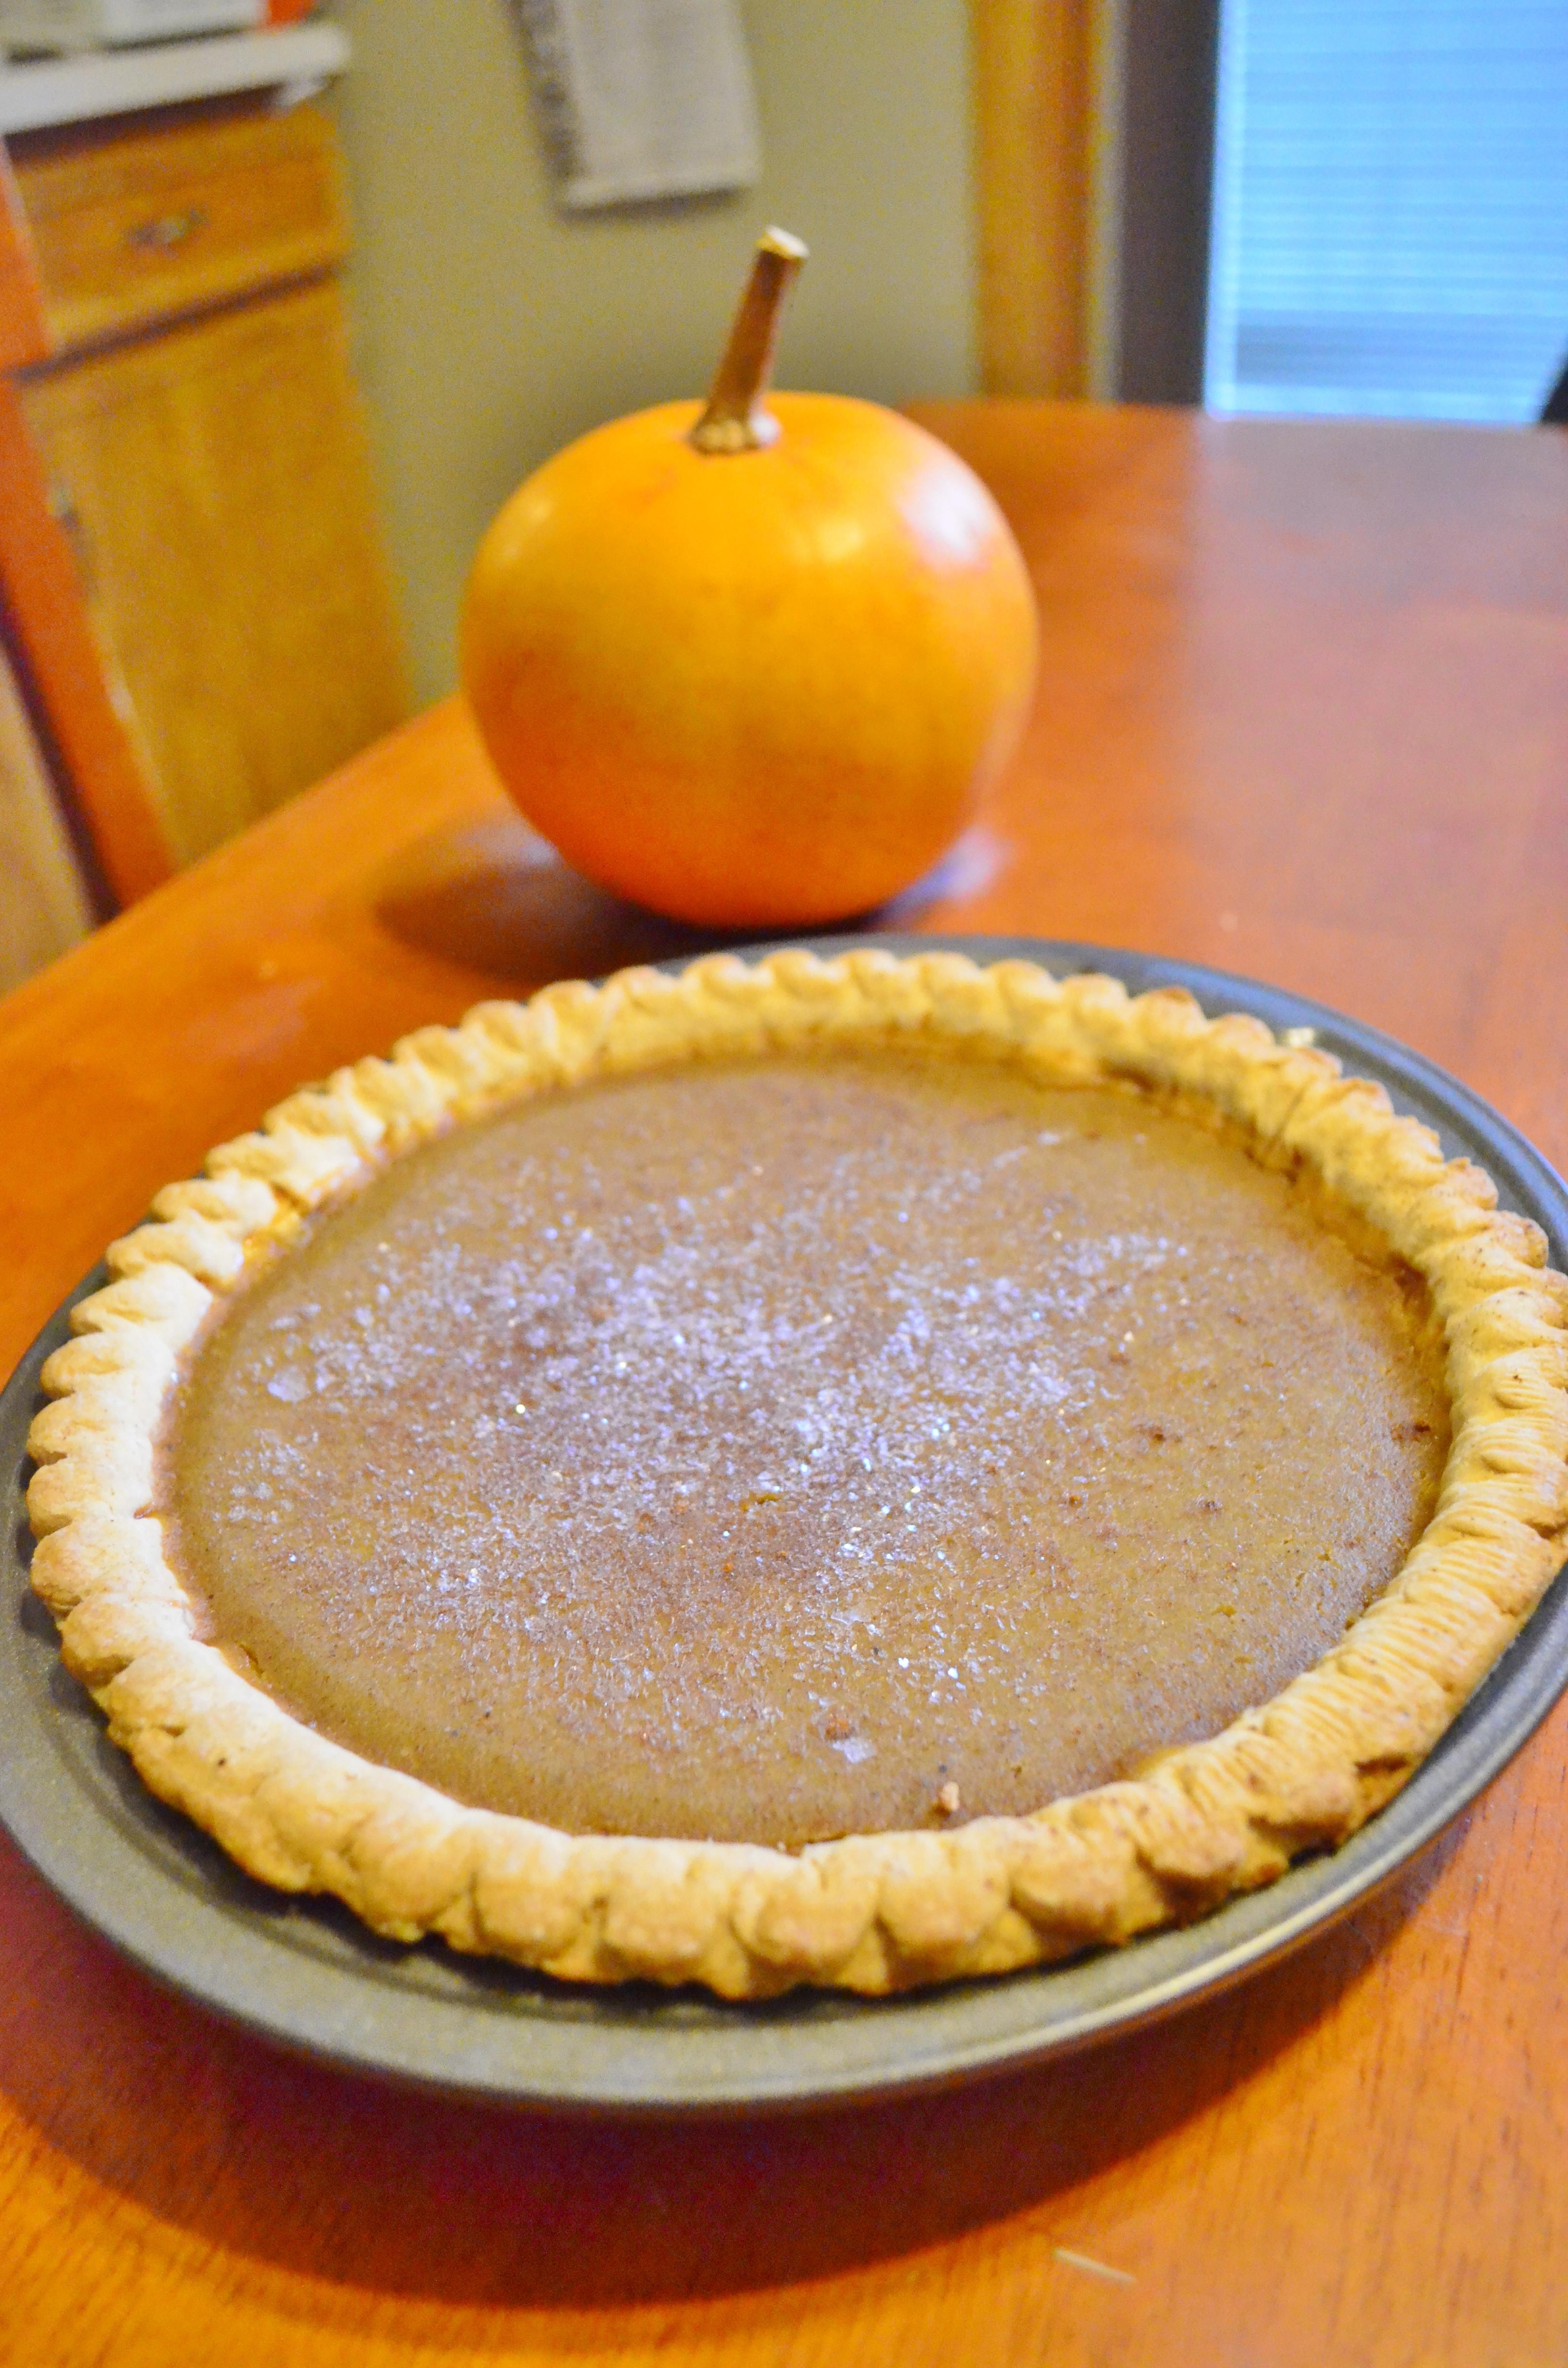 How To Make Pumpkin Pie From Scratch  Homemade Flavorful Pumpkin Pie from Scratch Recipe